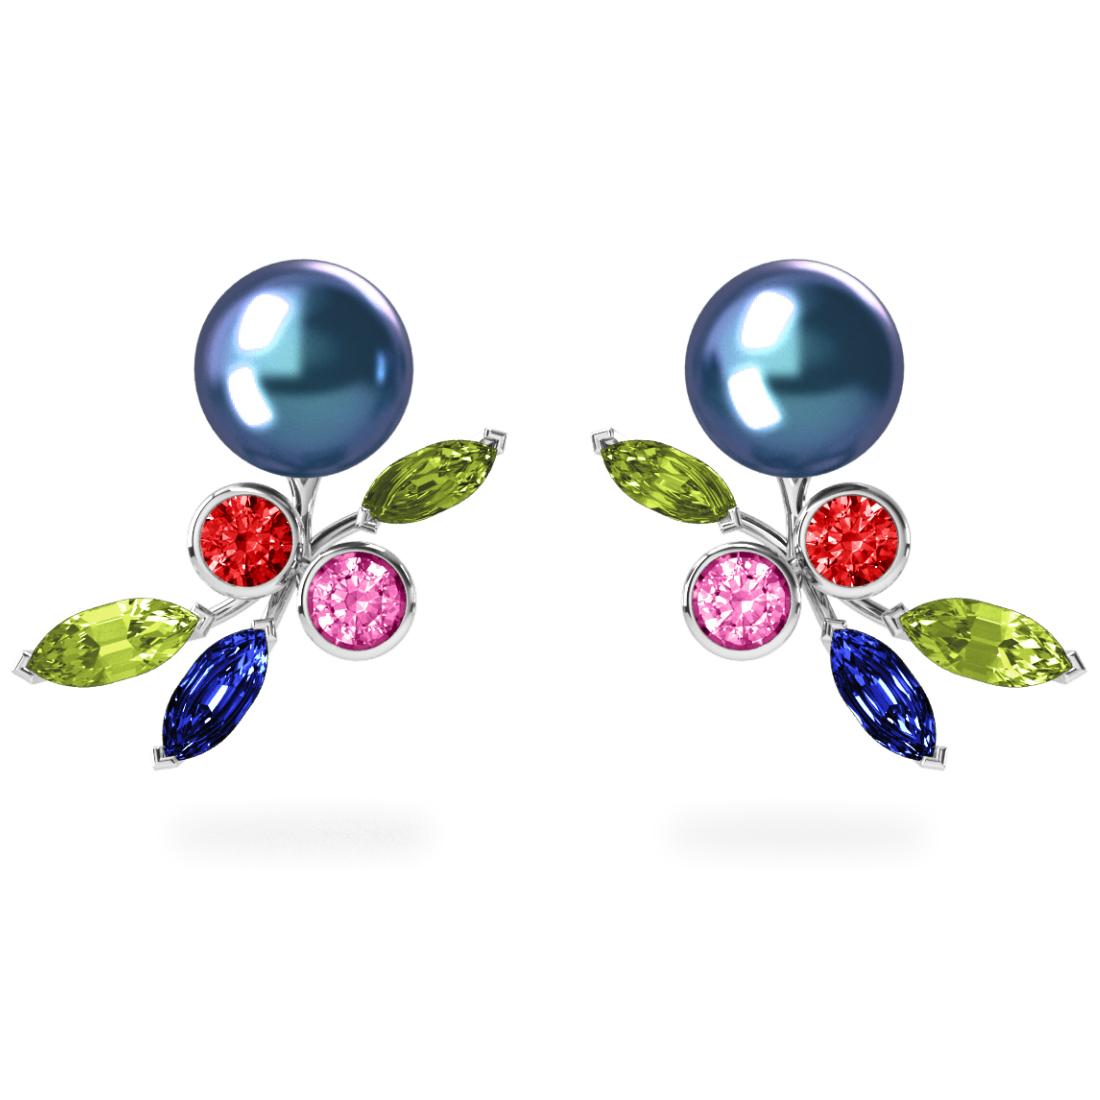 Boucles d'oreilles My Angel Peacock Céleste - Saphirs, diamants, peridots & perles de Tahiti <br /> Or blanc 18 carats